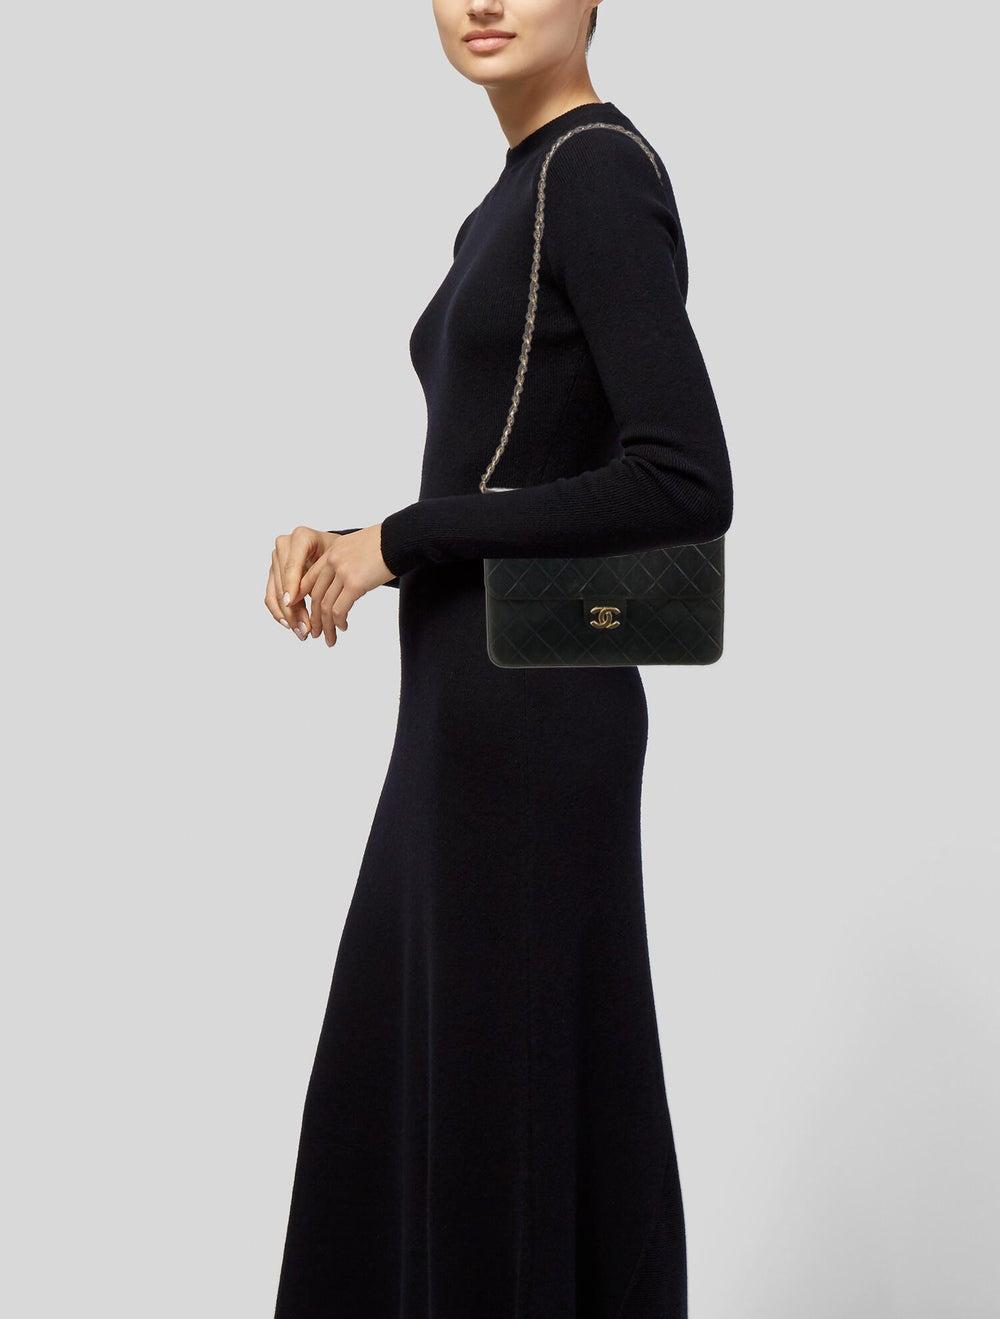 Chanel Vintage Classic Single Flap Bag Blue - image 2